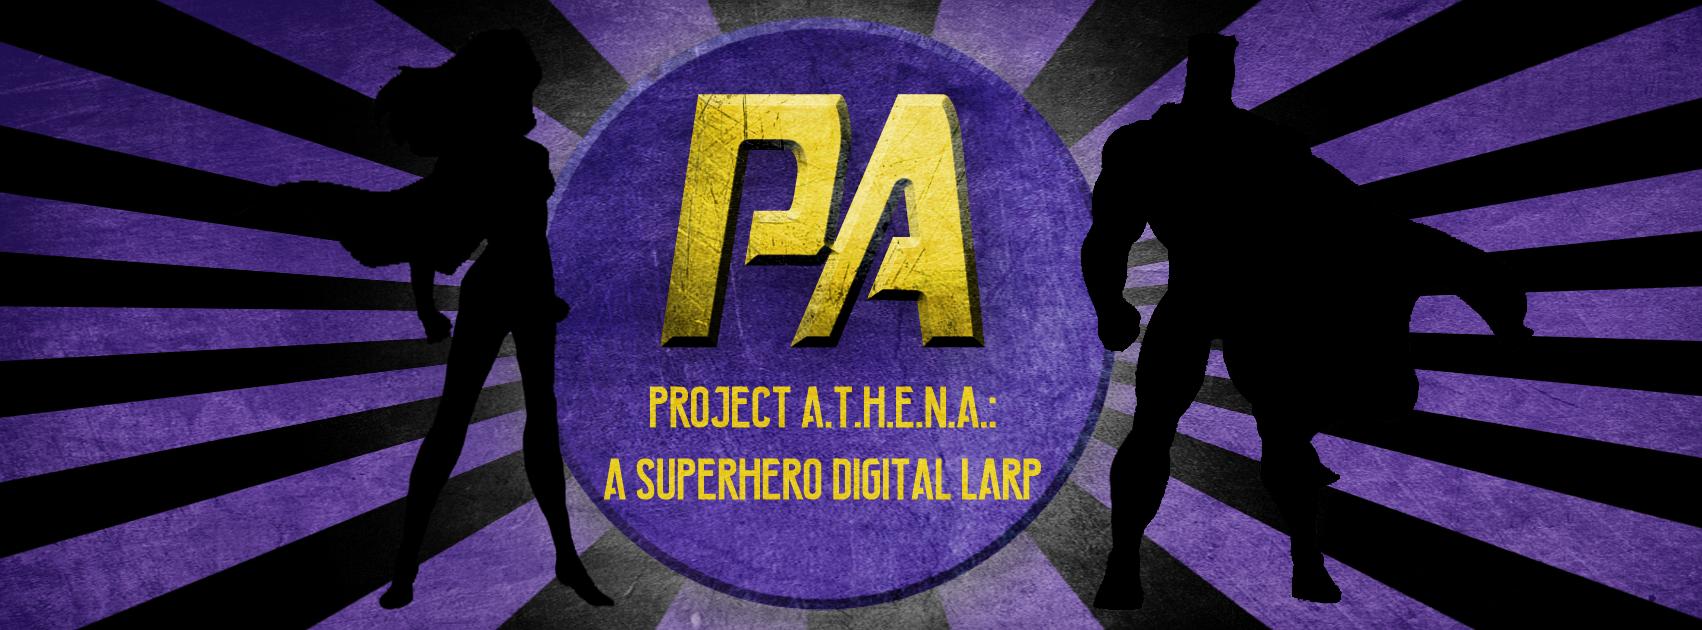 project athena digital larp final